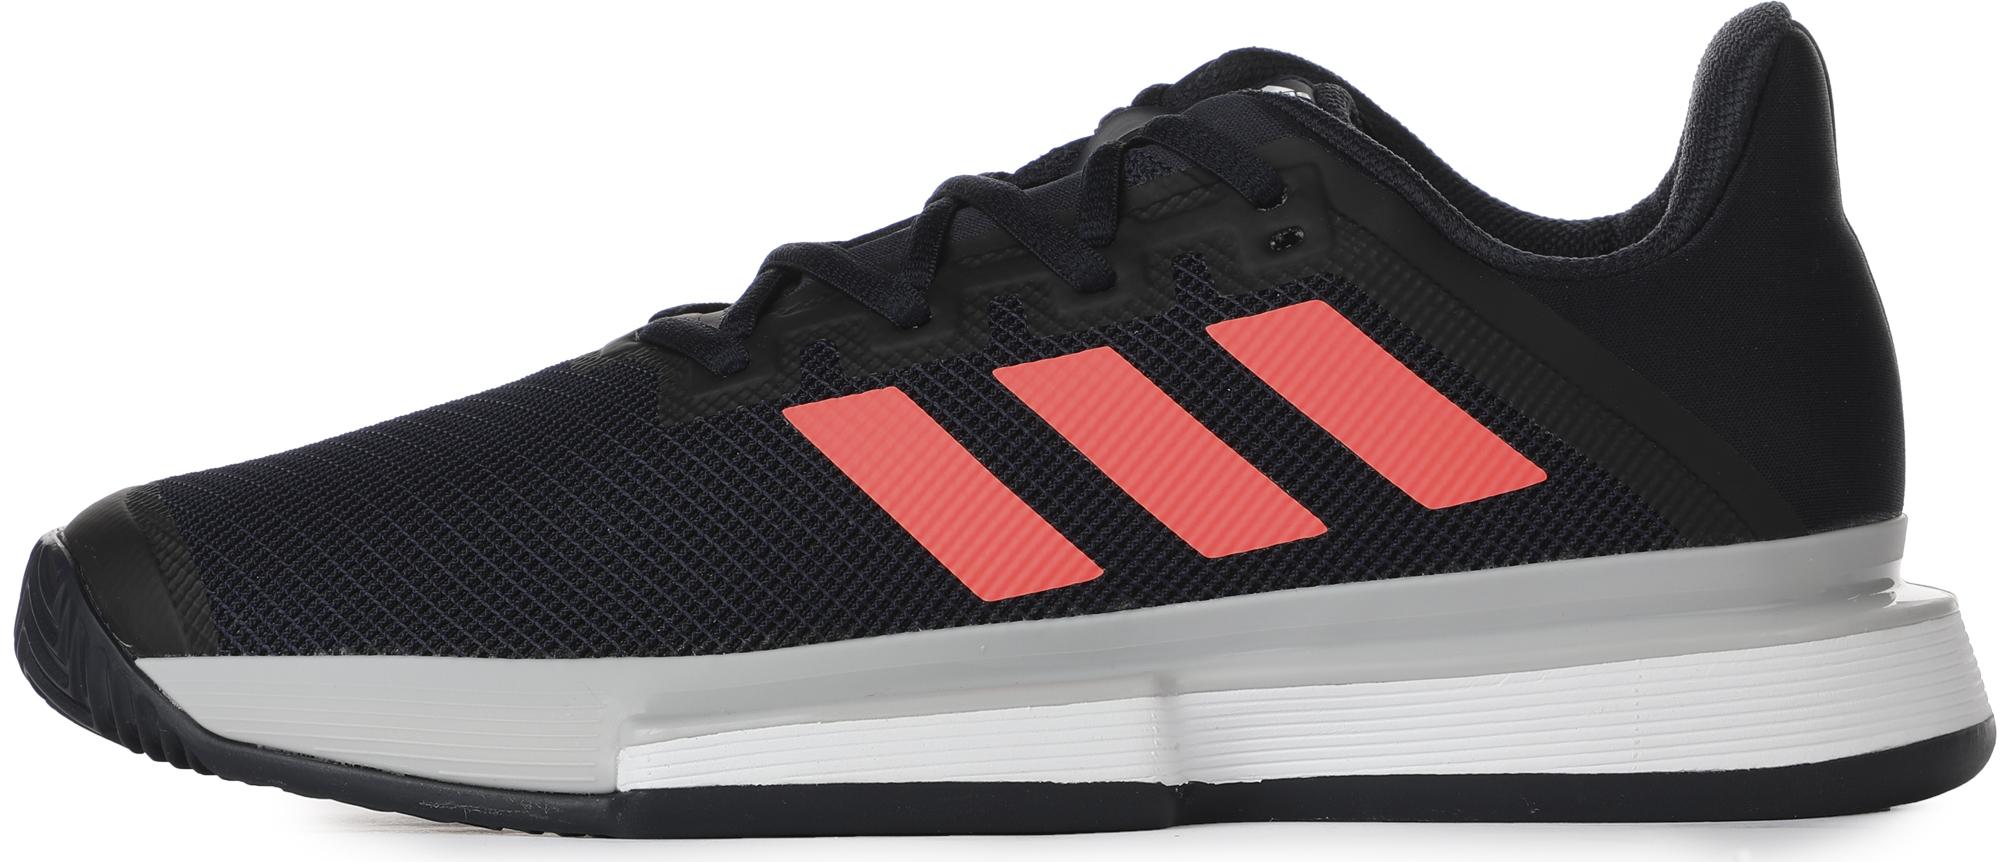 Adidas Кроссовки женские Adidas SoleMatch Bounce, размер 38.5 adidas all court